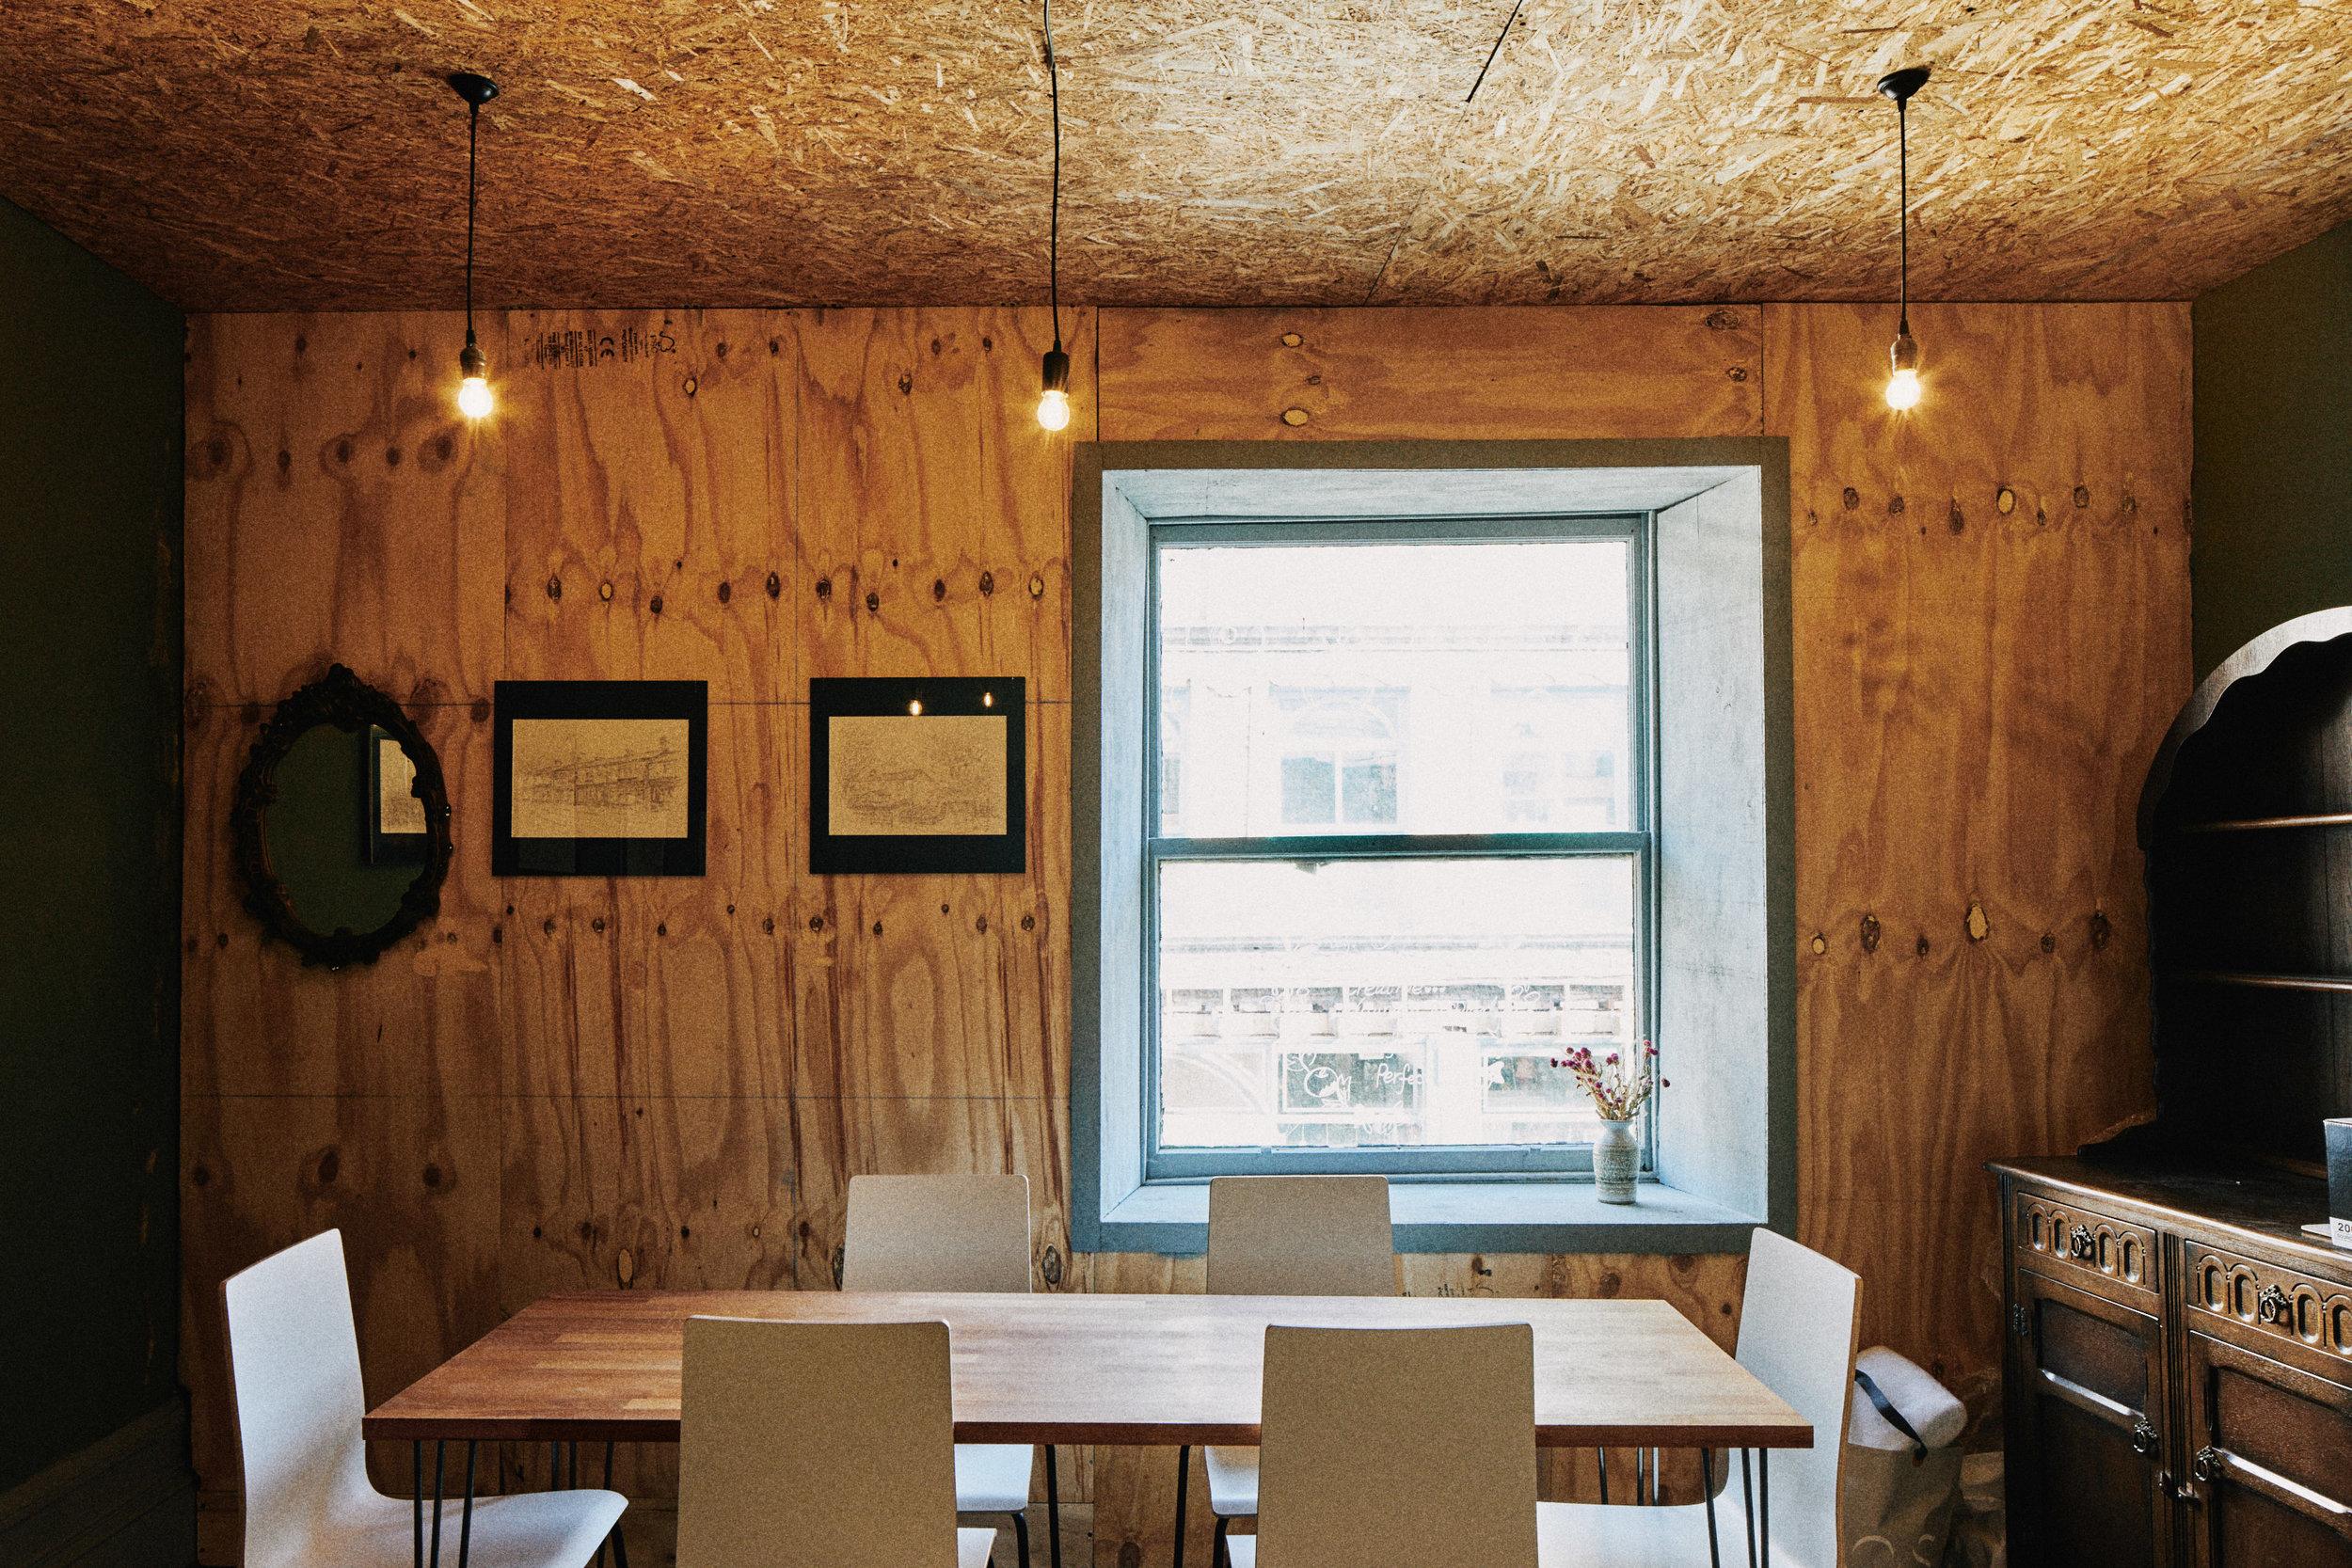 tea_atelier_180925_tea_atelier_interior_0010.jpg